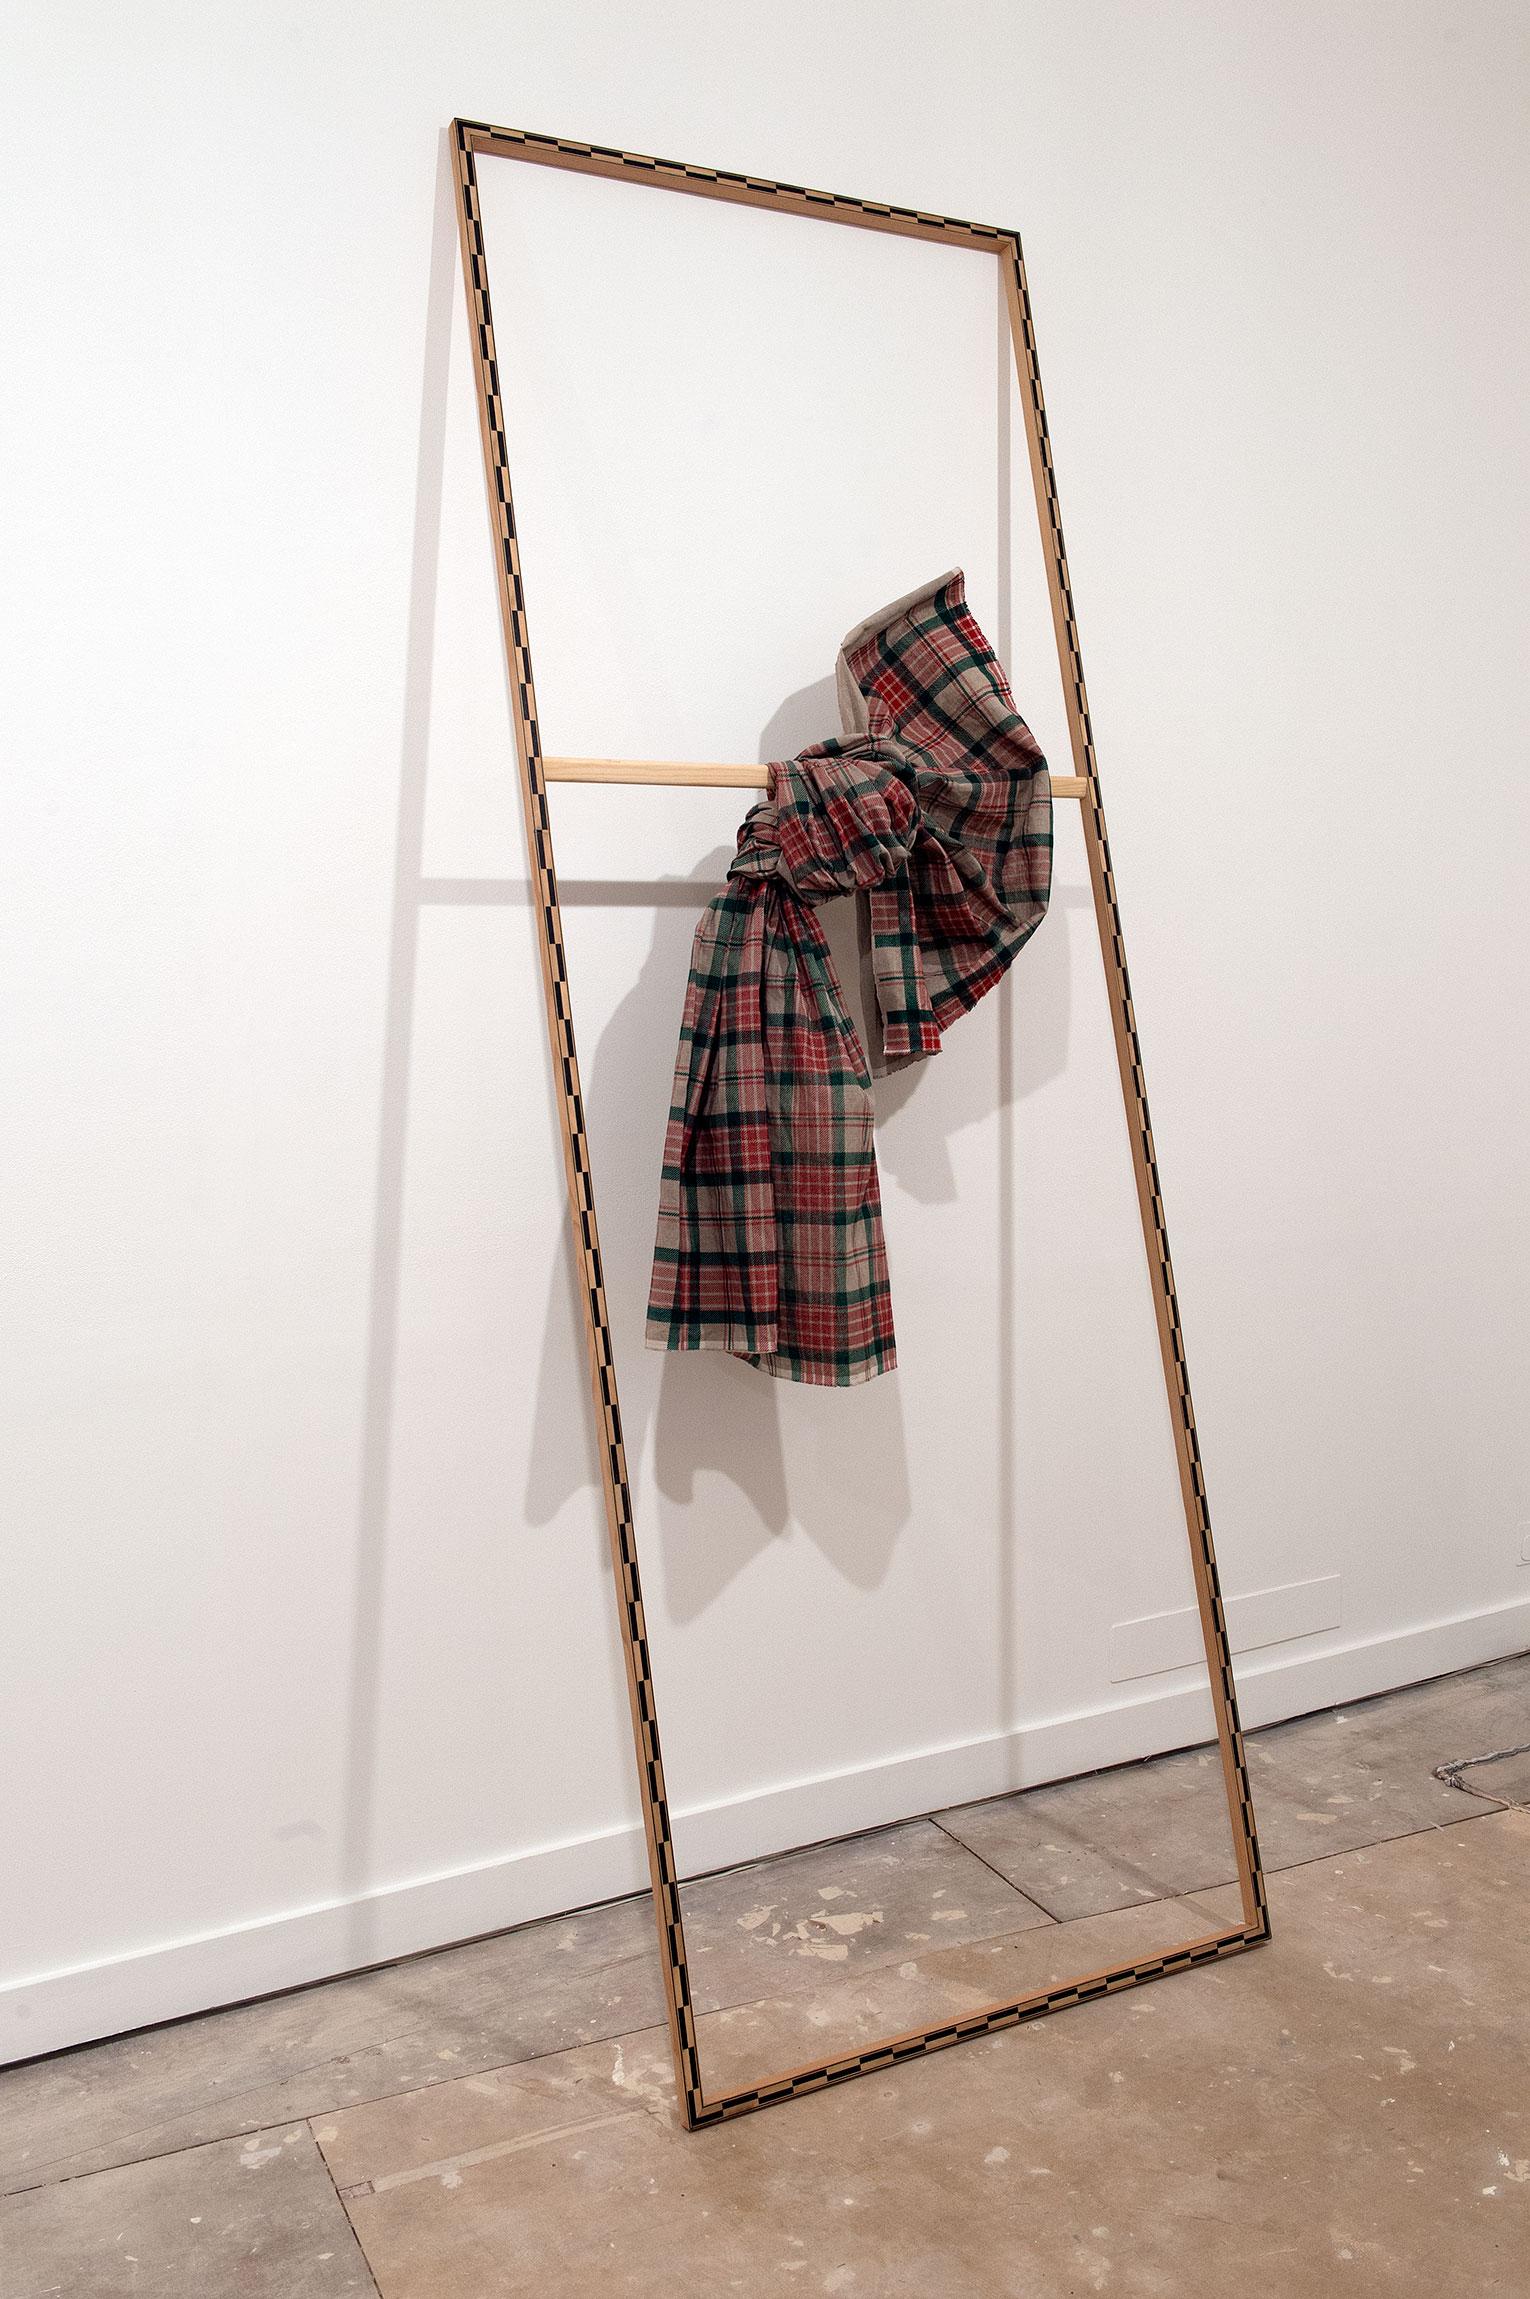 <b>Title:</b>Frasier<br /><b>Year:</b>2013<br /><b>Medium:</b>Ebony, Boxwood, Douglas Fir, linen, silkscreen print<br /><b>Size:</b>263 x 95 x 80 cm